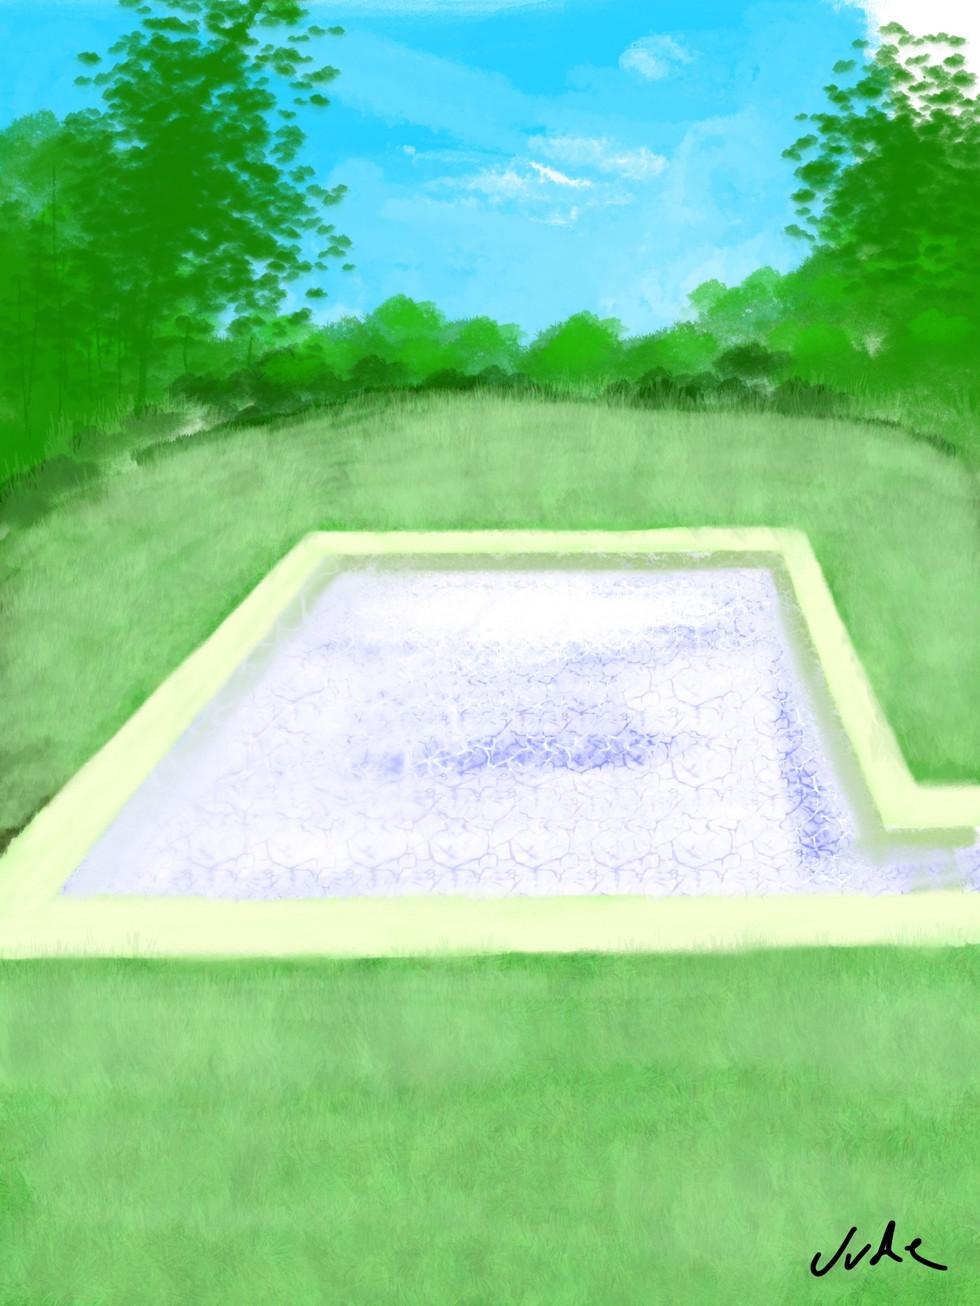 Secluded Swimming Pool - Stylus on iPad Procreate